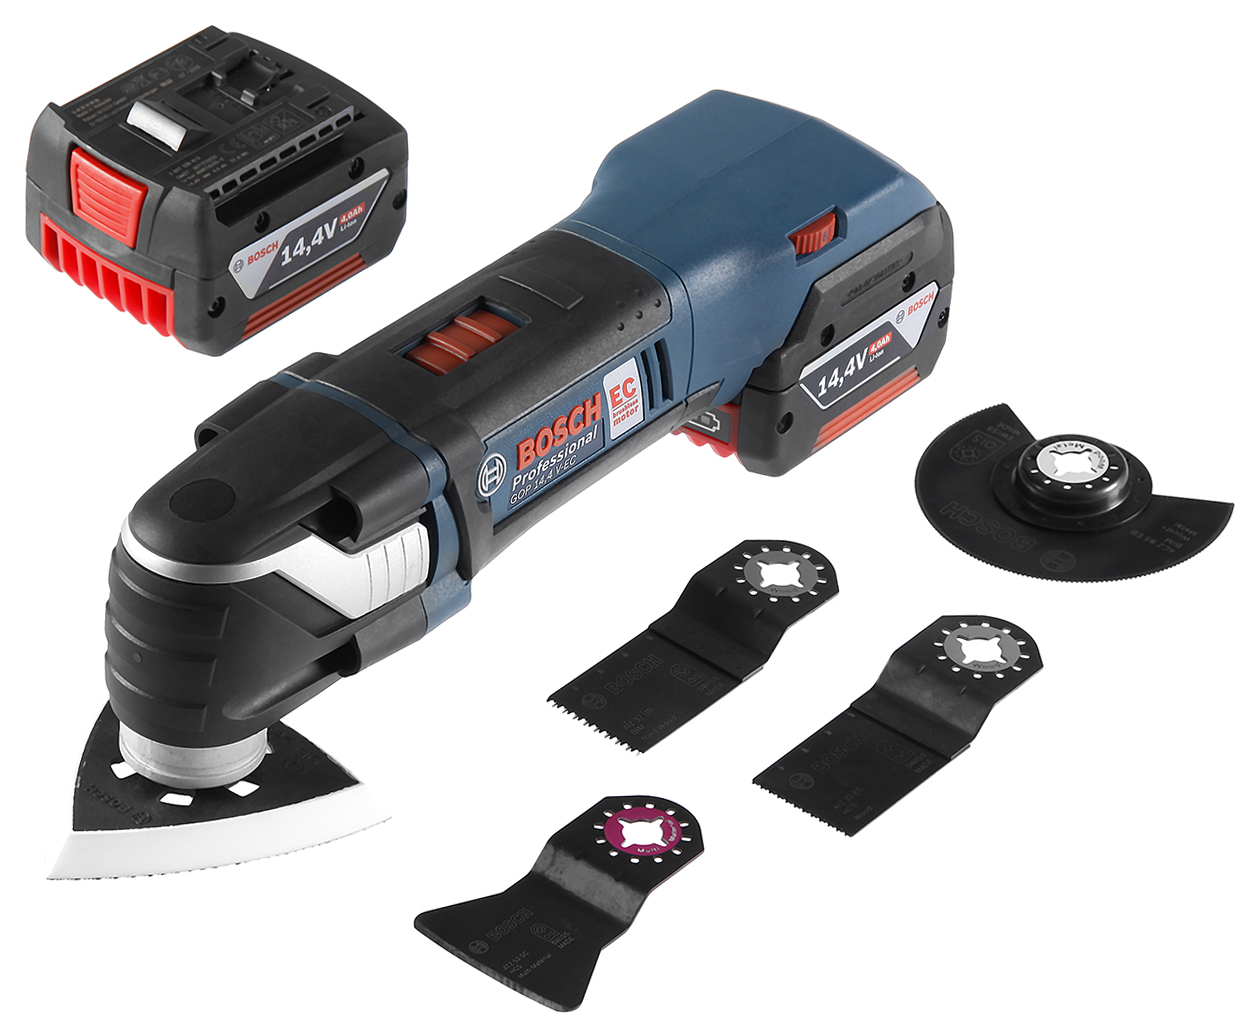 Аккумуляторный реноватор Bosch Gop 14,4 v-ec l-boxx (0.601.8b0.101)